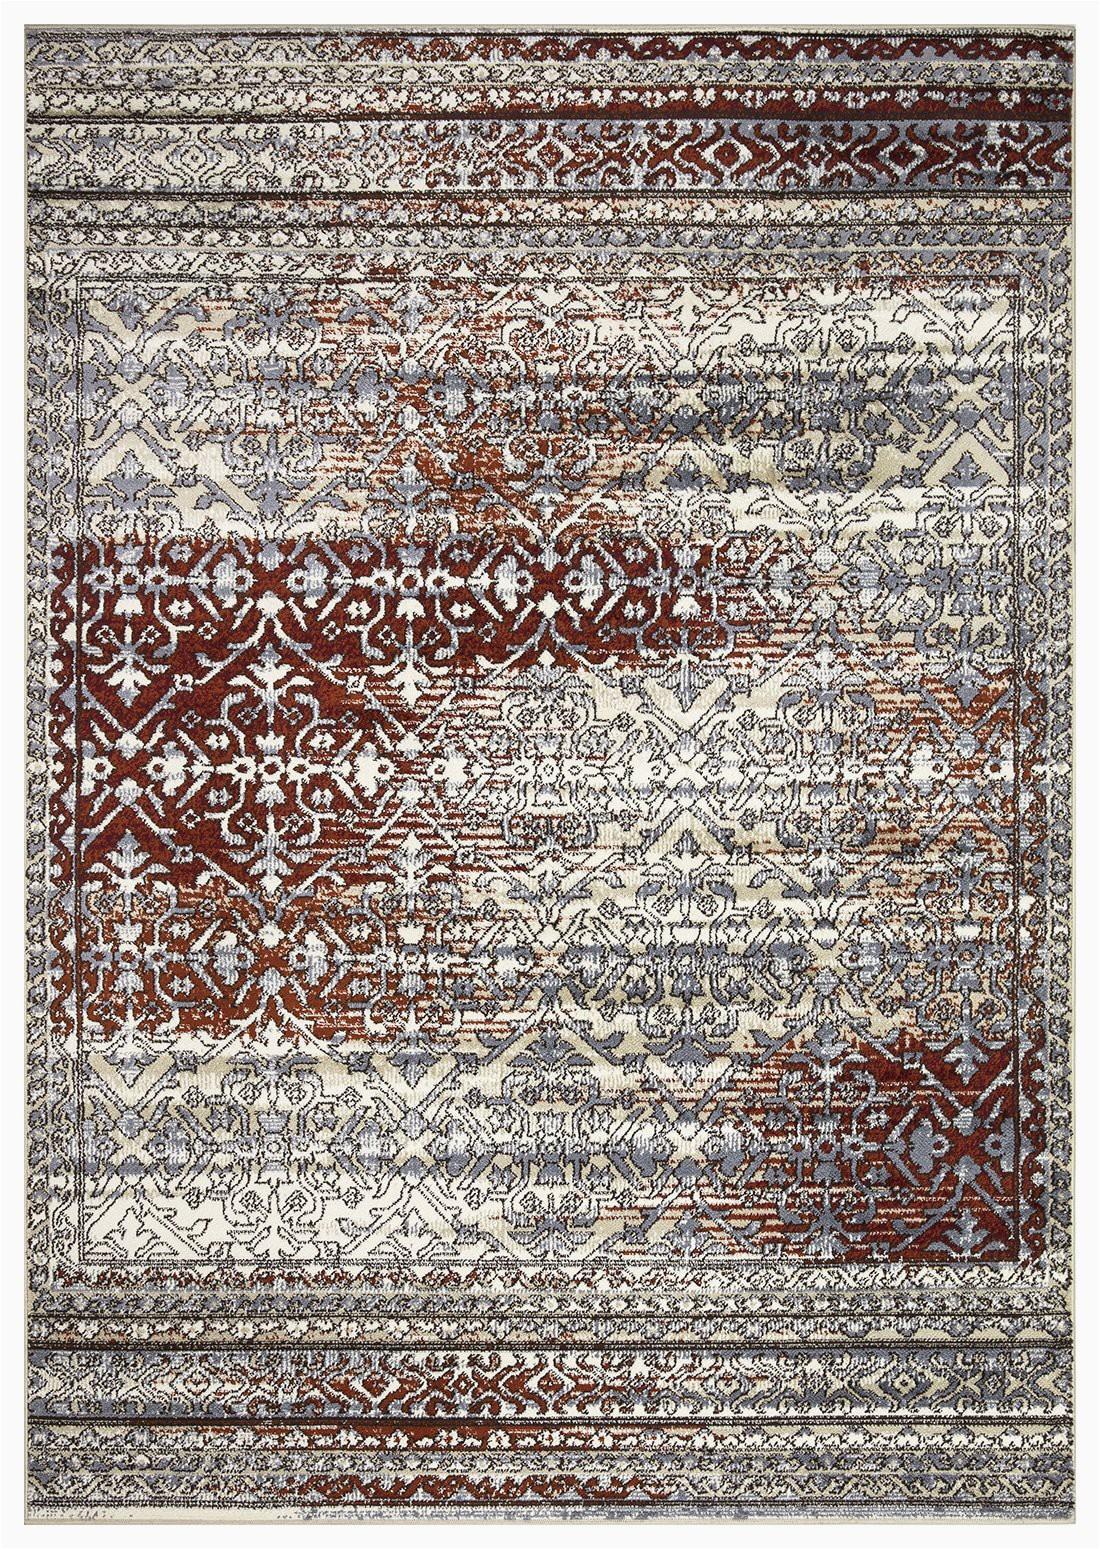 artemis collection vintage oriental area rug 1006a burgundy 5 2 x 7 6